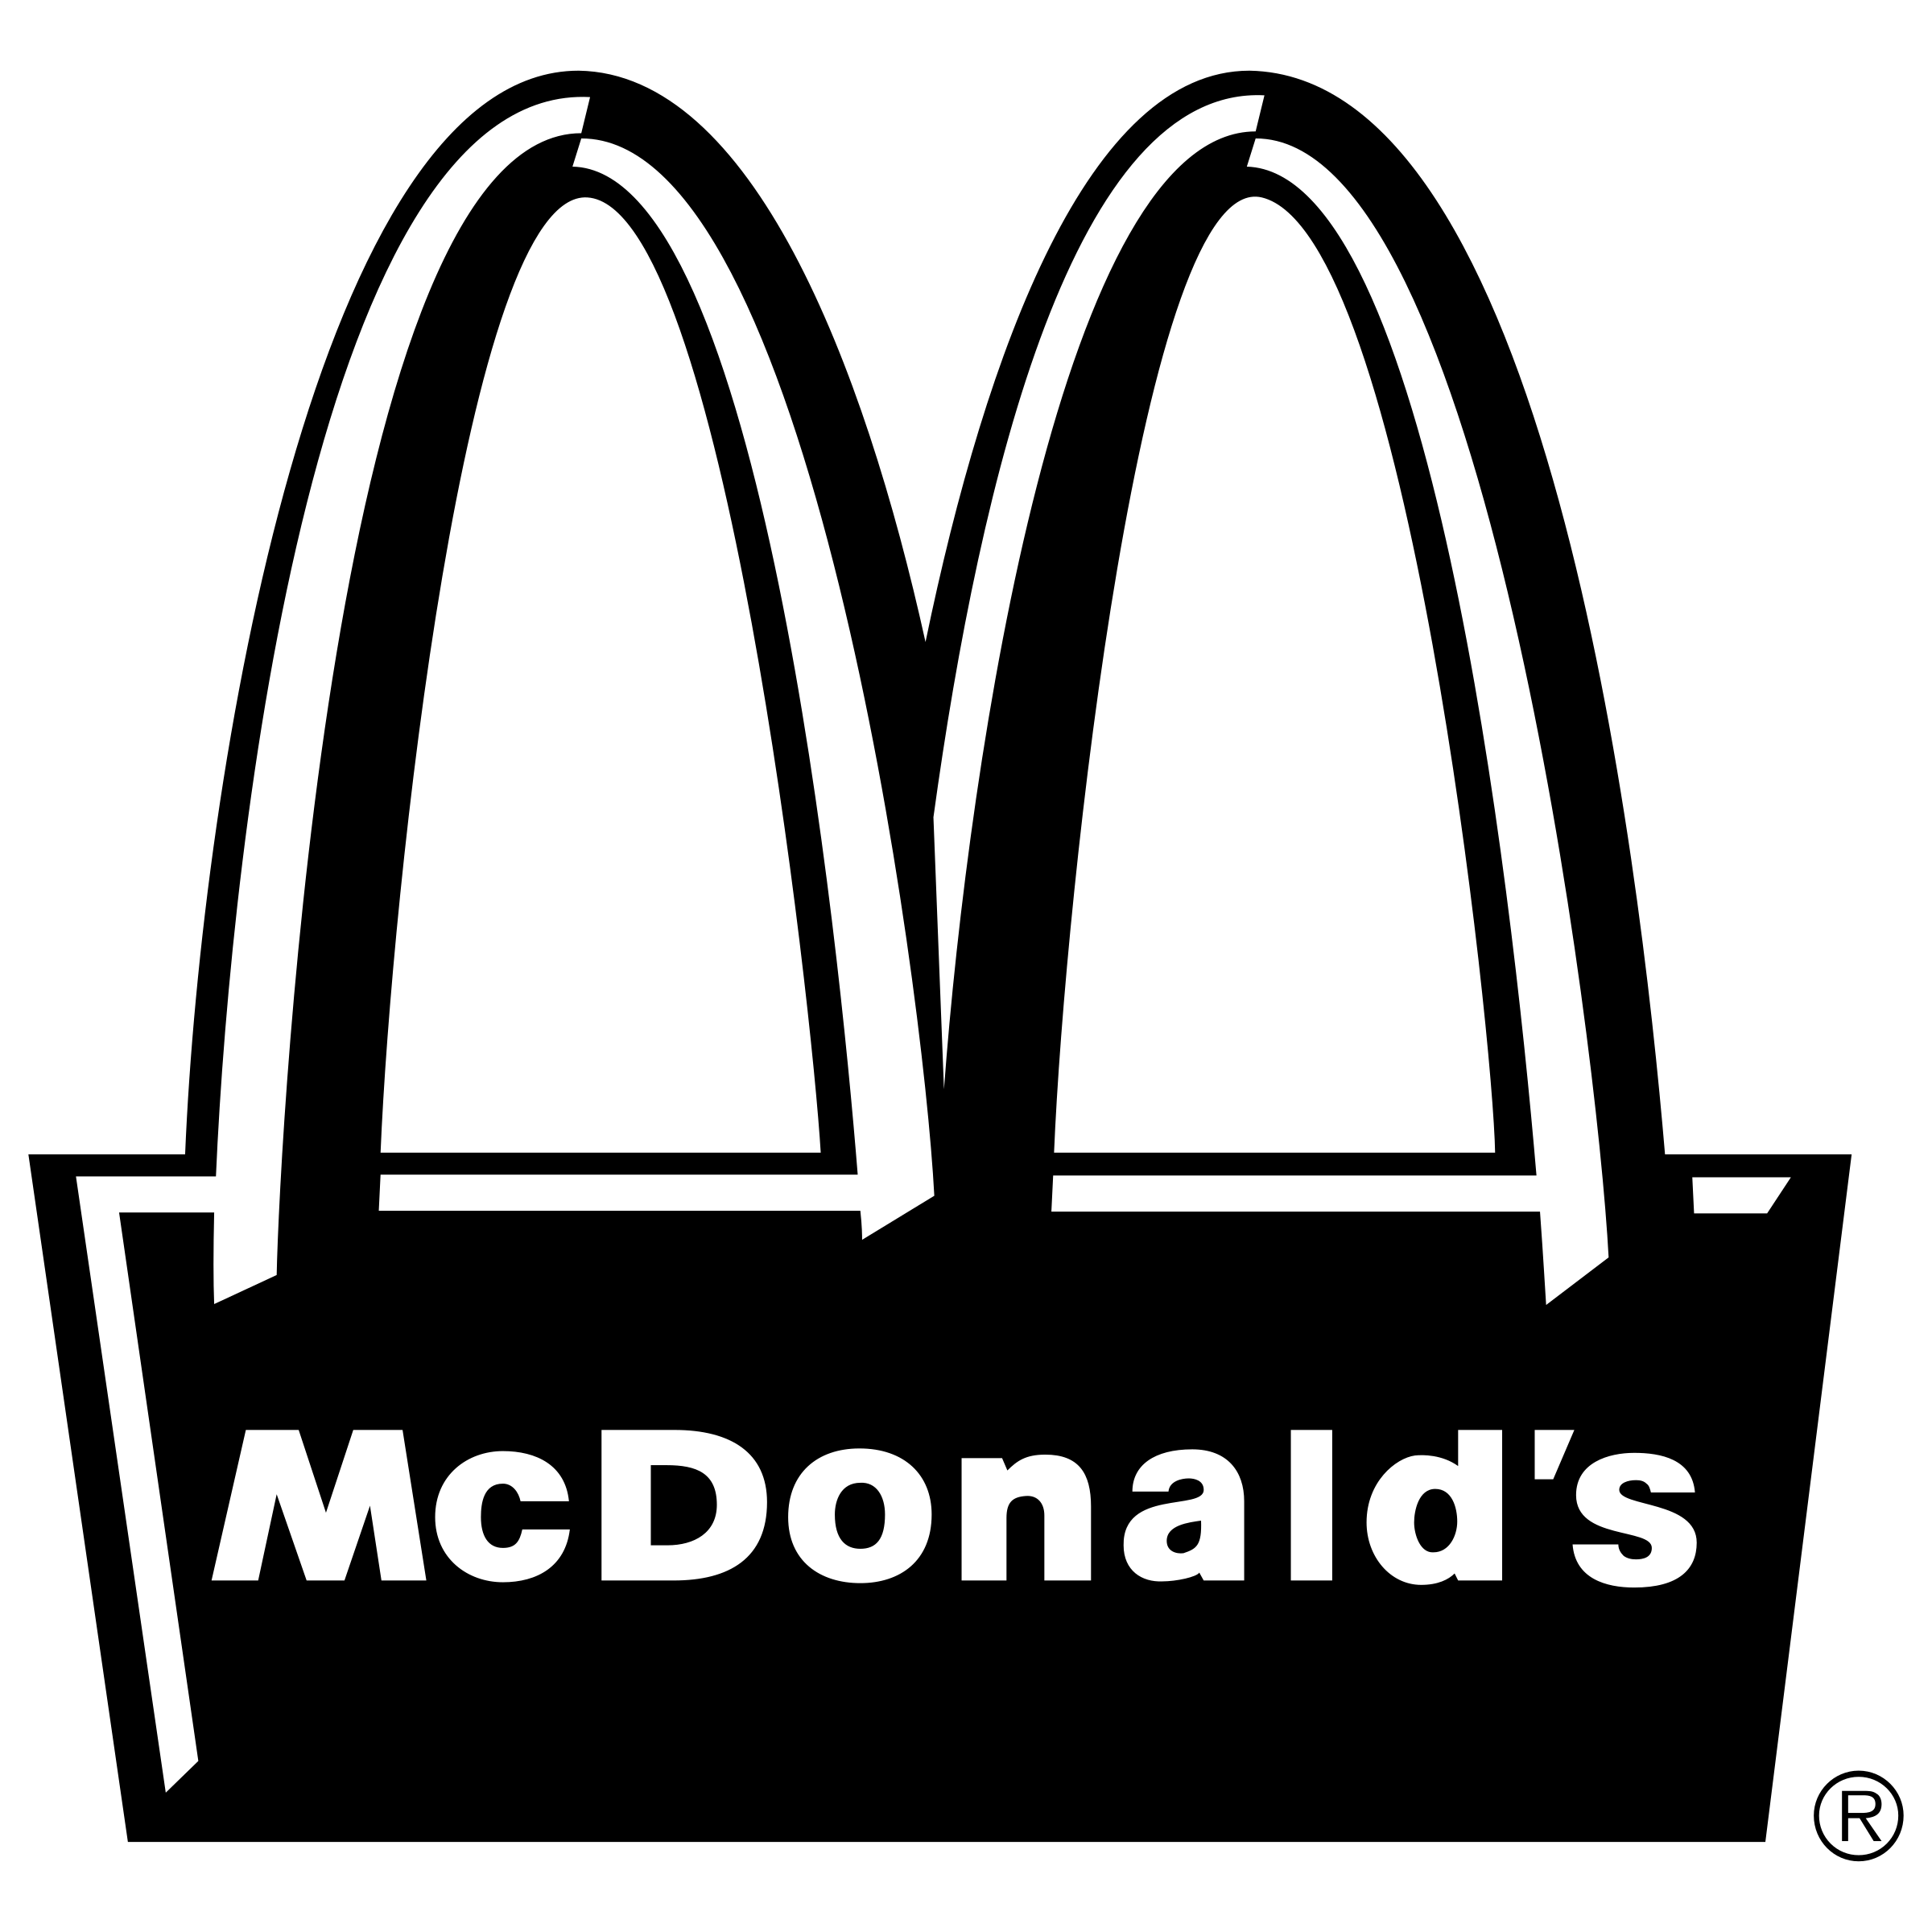 McDonald's Logo PNG Transparent & SVG Vector - Freebie Supply